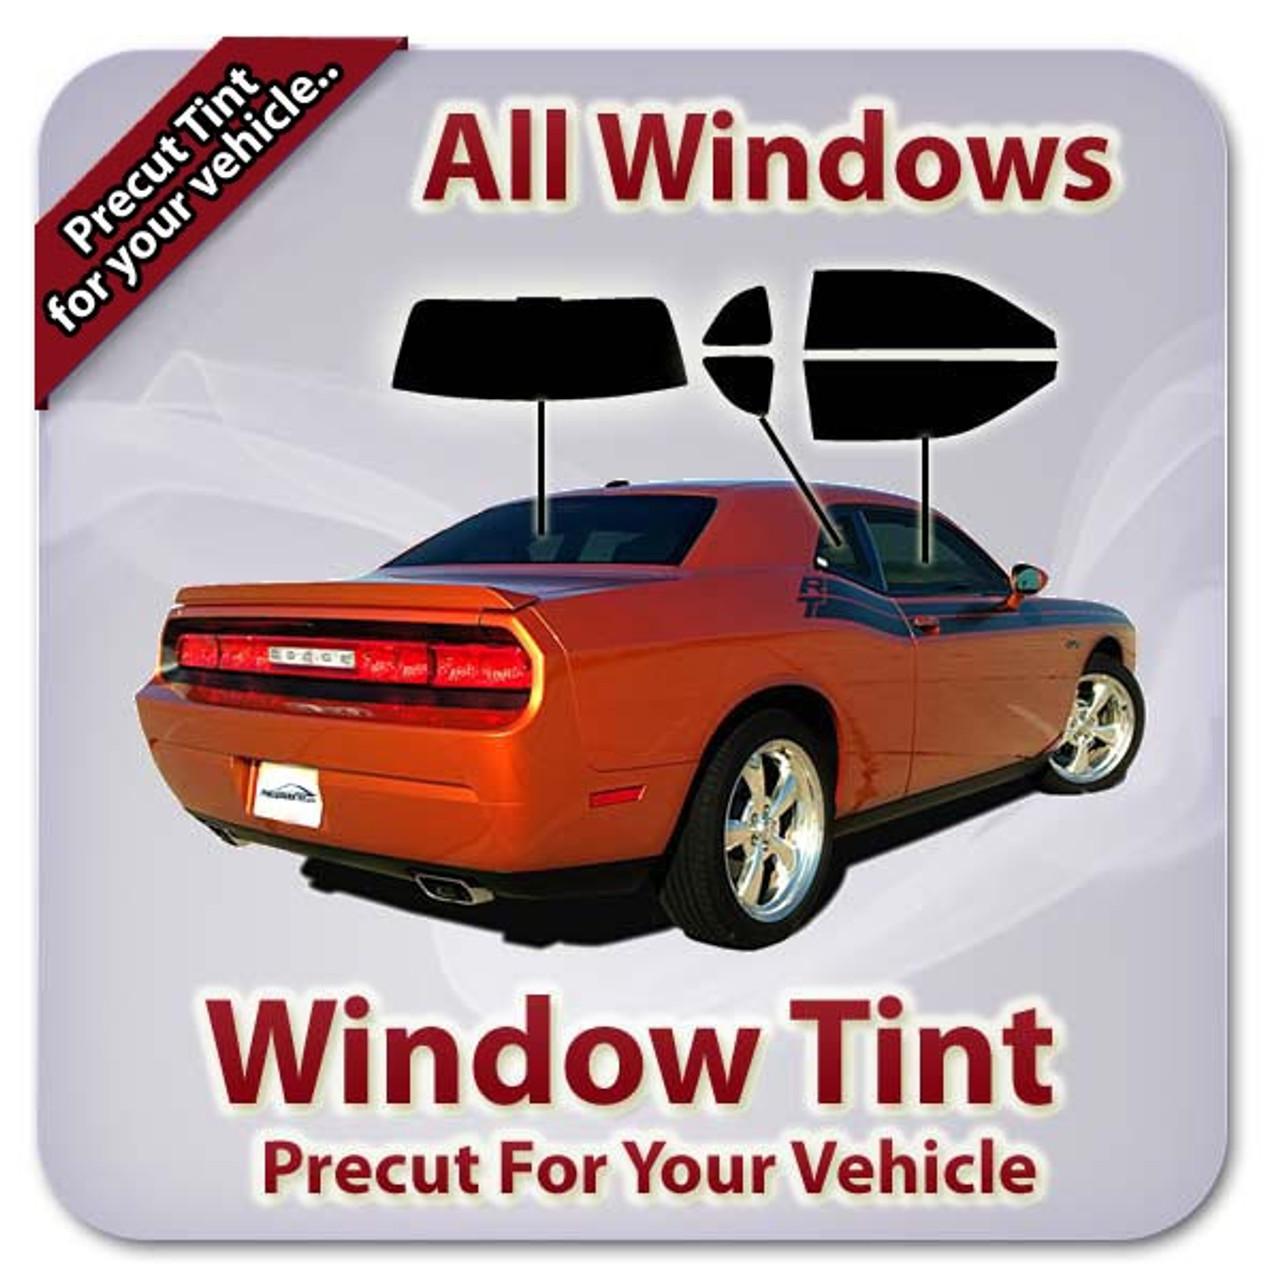 PreCut Film Front Two Door Windows Any Tint Shade /% for Hyundai Palisade 2020